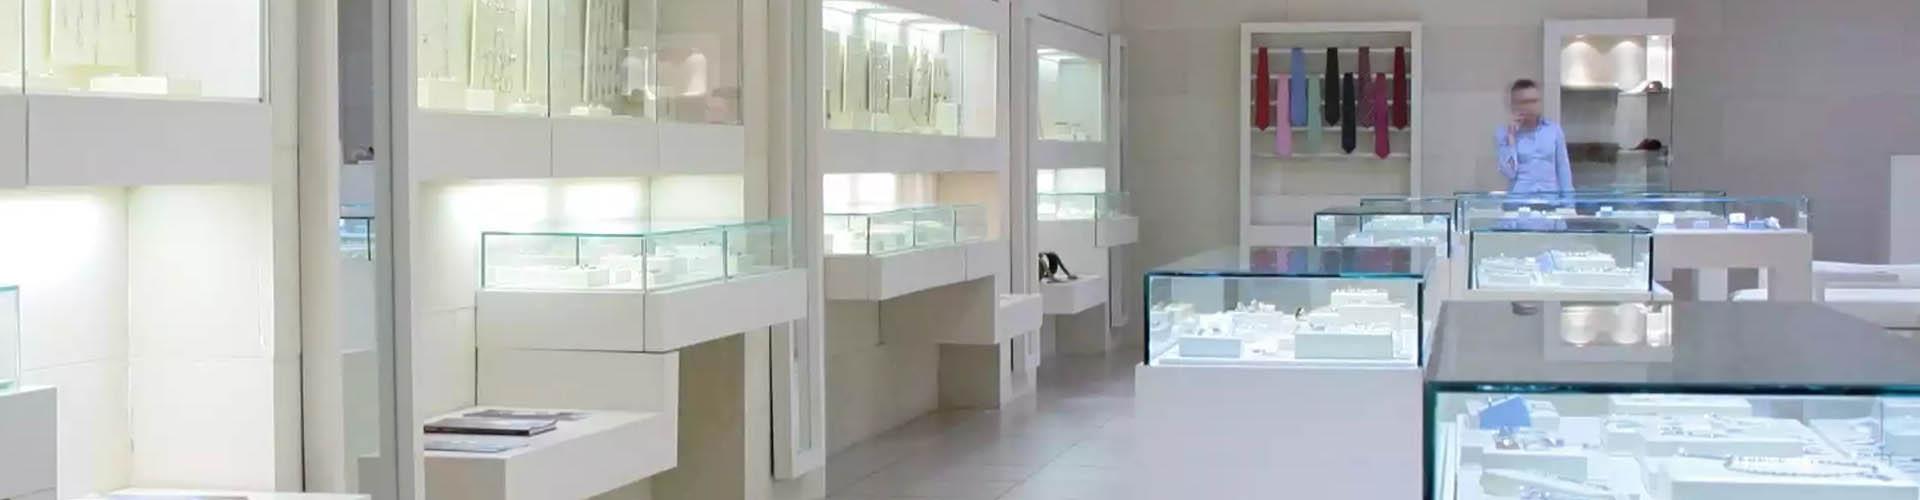 Jewelry Store POS system, Jewelry Store POS System